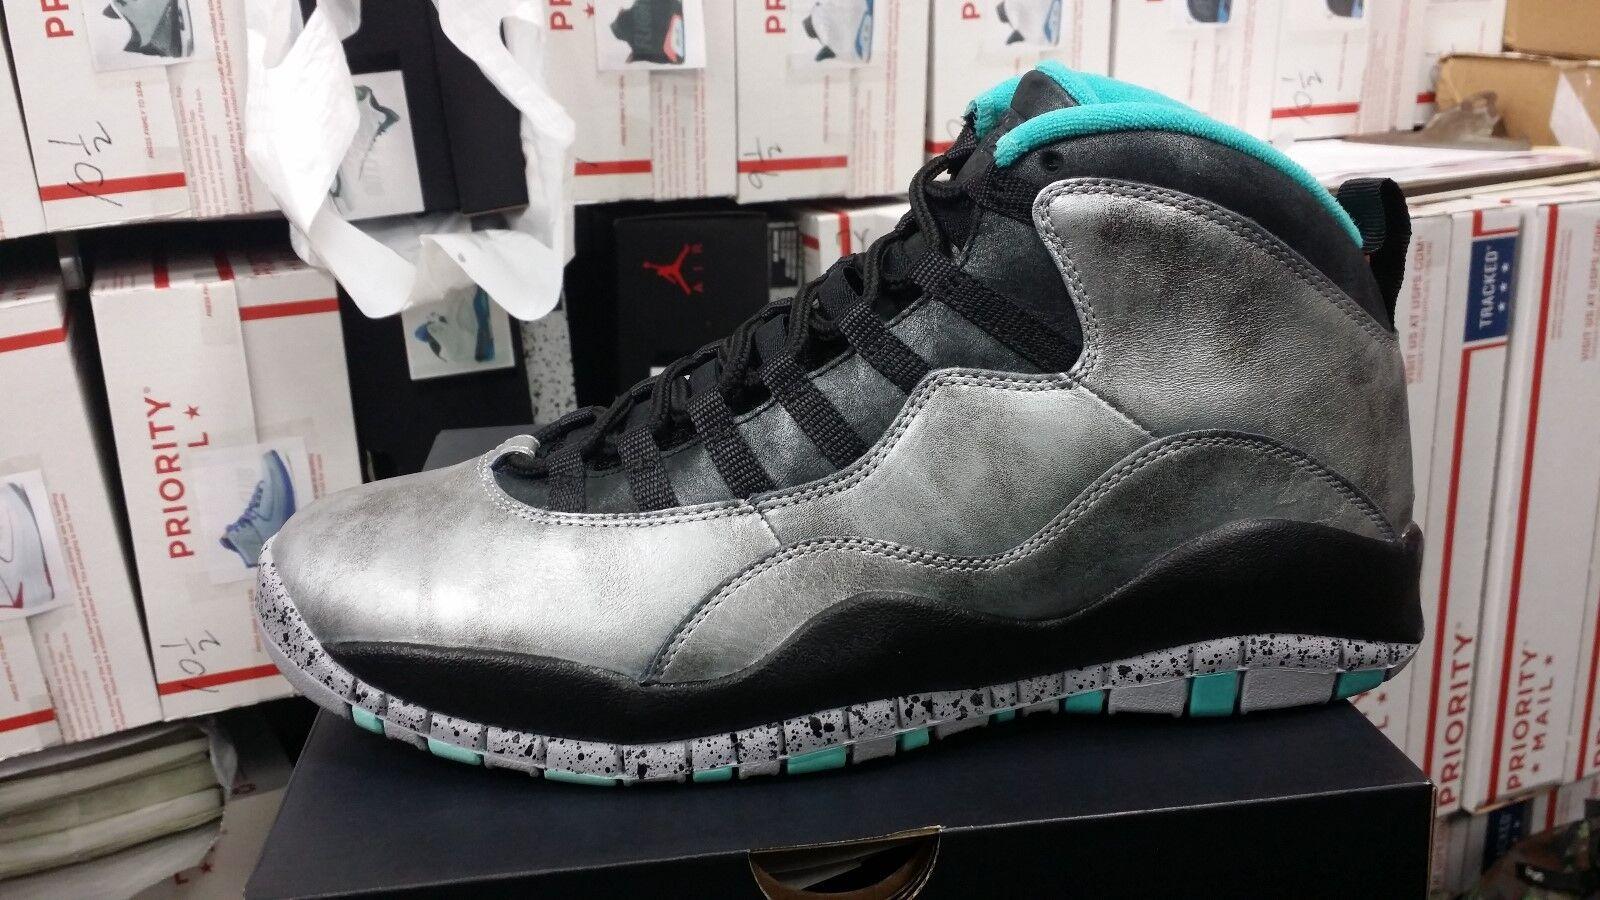 Nike Air Jordan 10 Retro Uomo size